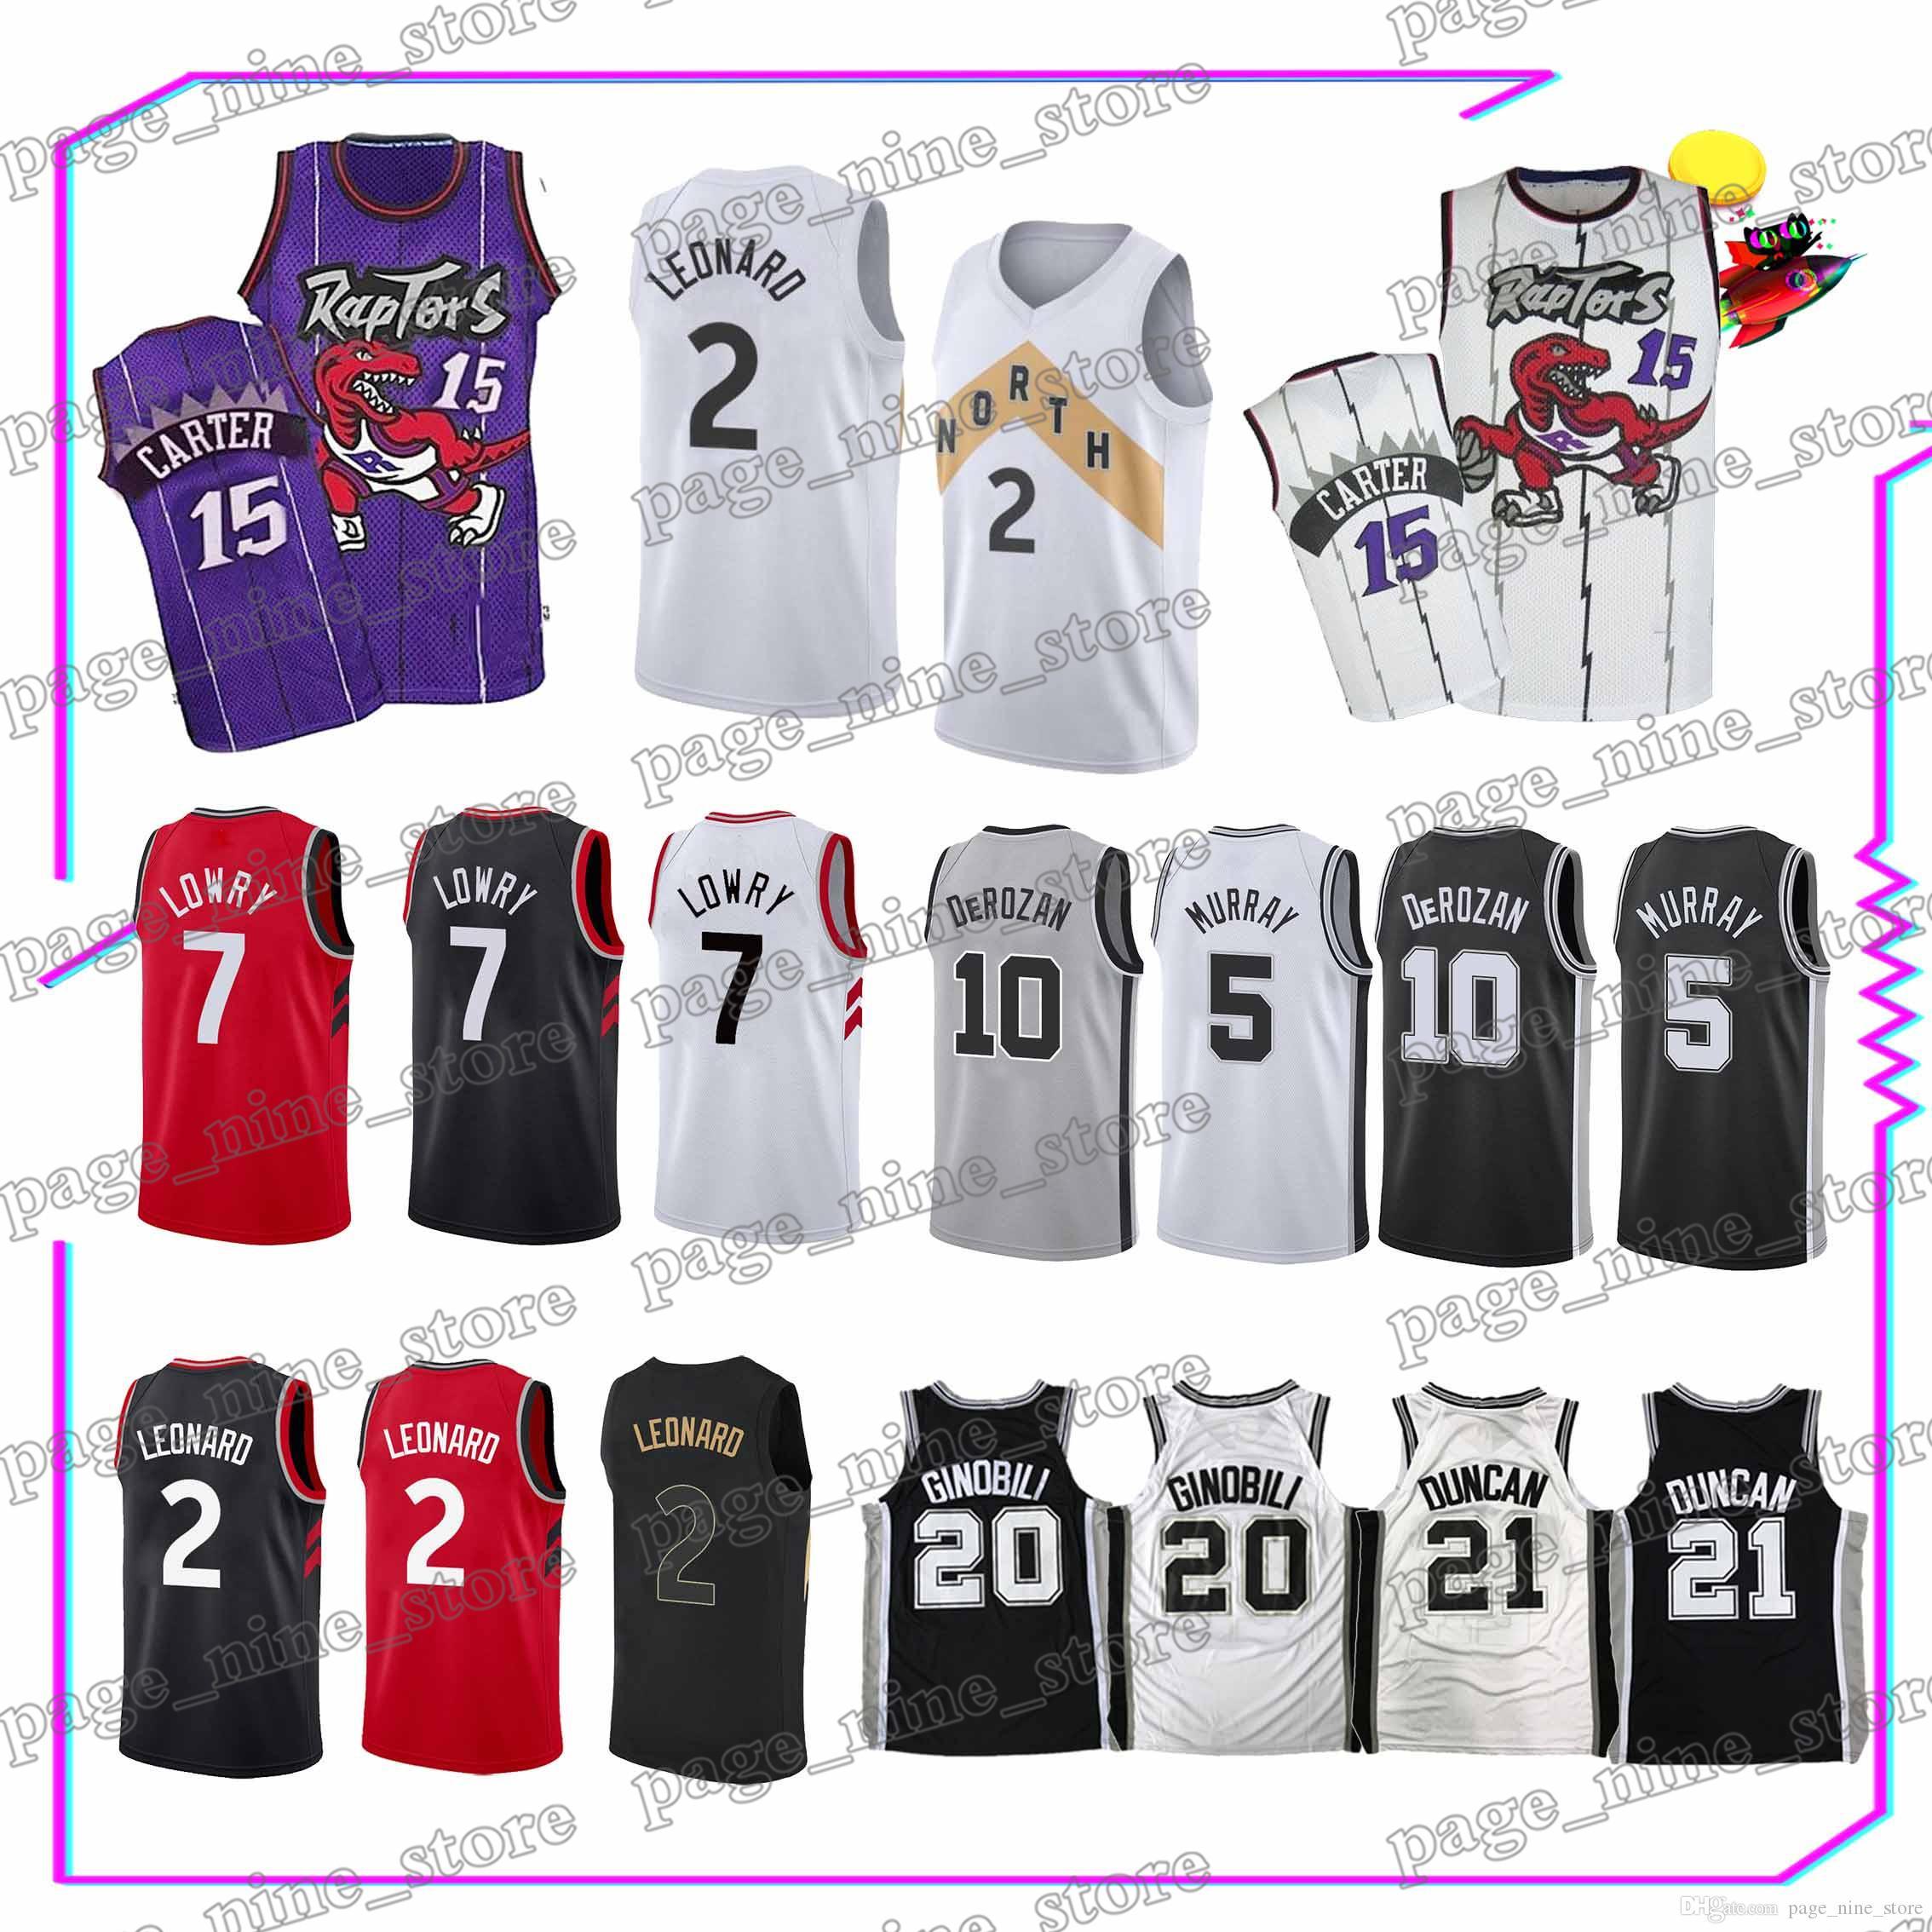 half off e1b10 84270 Toronto Raptors t shirt 7 Kyle Lowry 2 Kawhi Leonard Spurs 10 DeMar DeRozan  20 Manu Ginobili 21 Tim Duncan jerseys